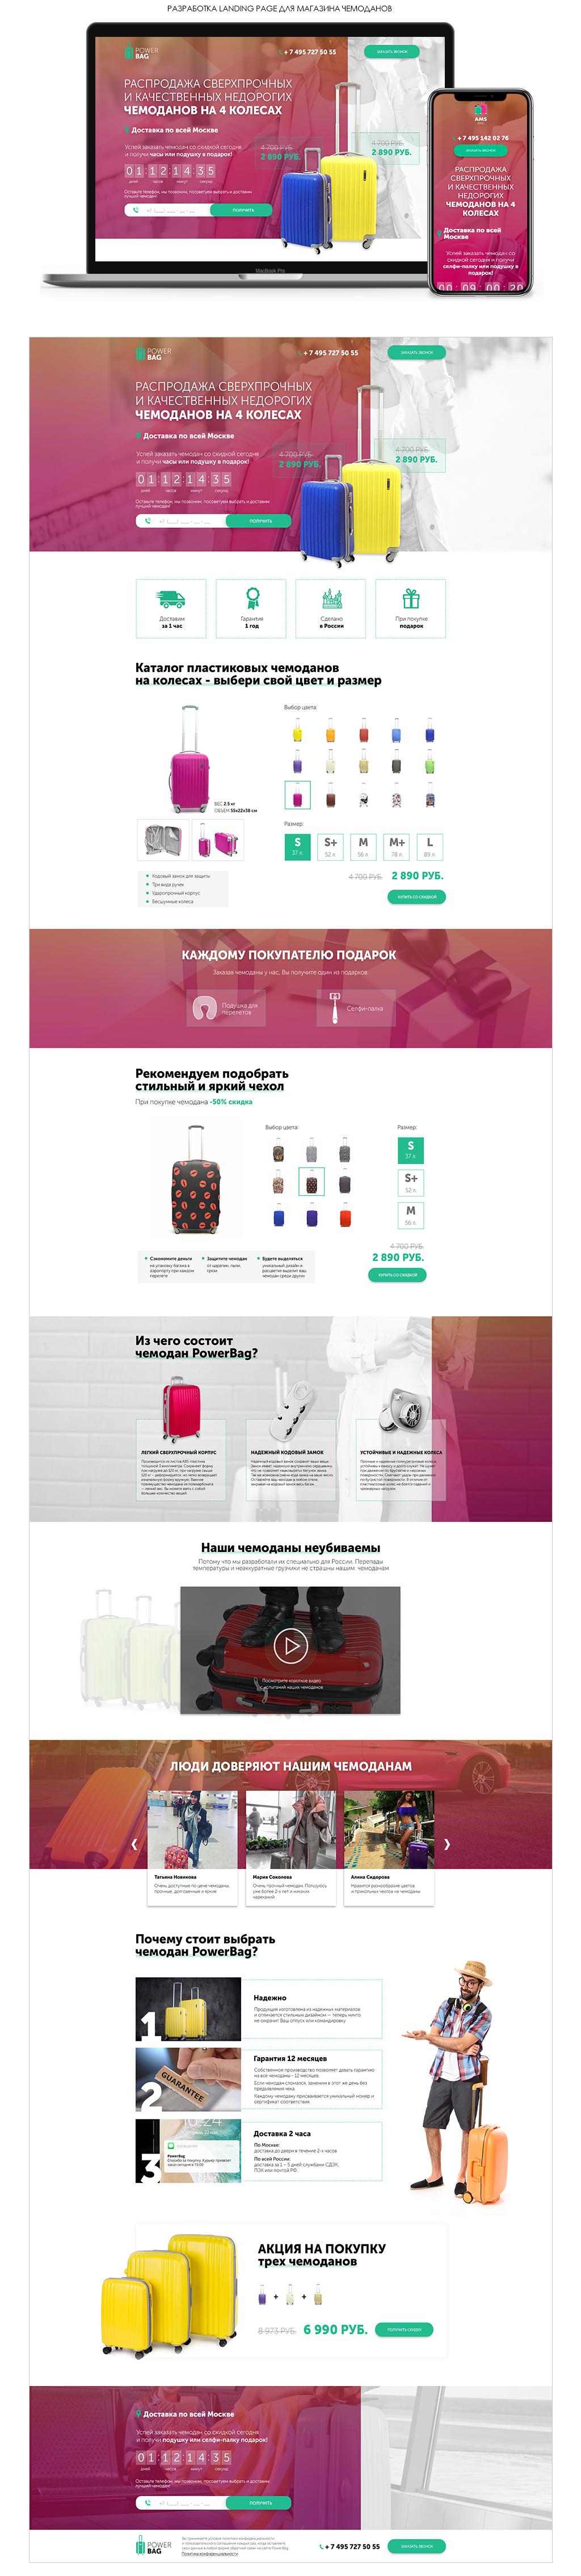 Landing page по продаже чемоданов - AmsBag